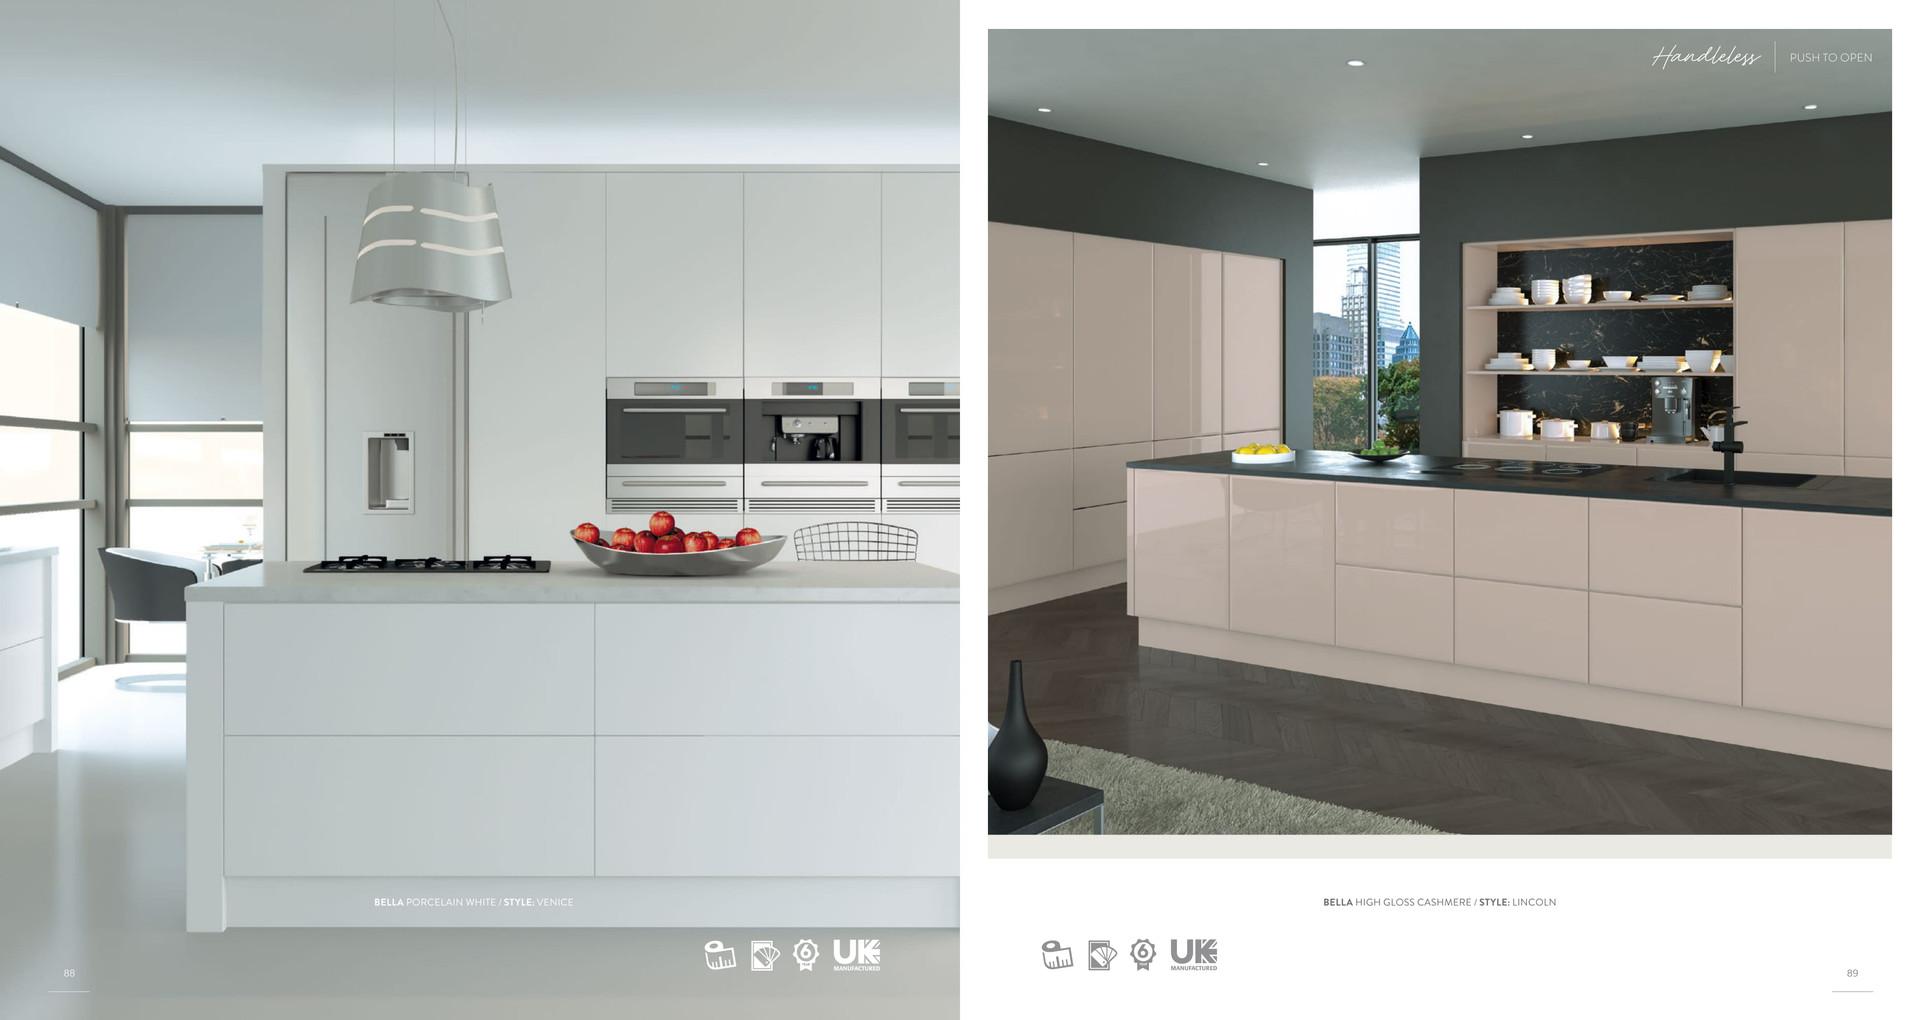 blossom-avenue-kitchen-brochure-2020-45.